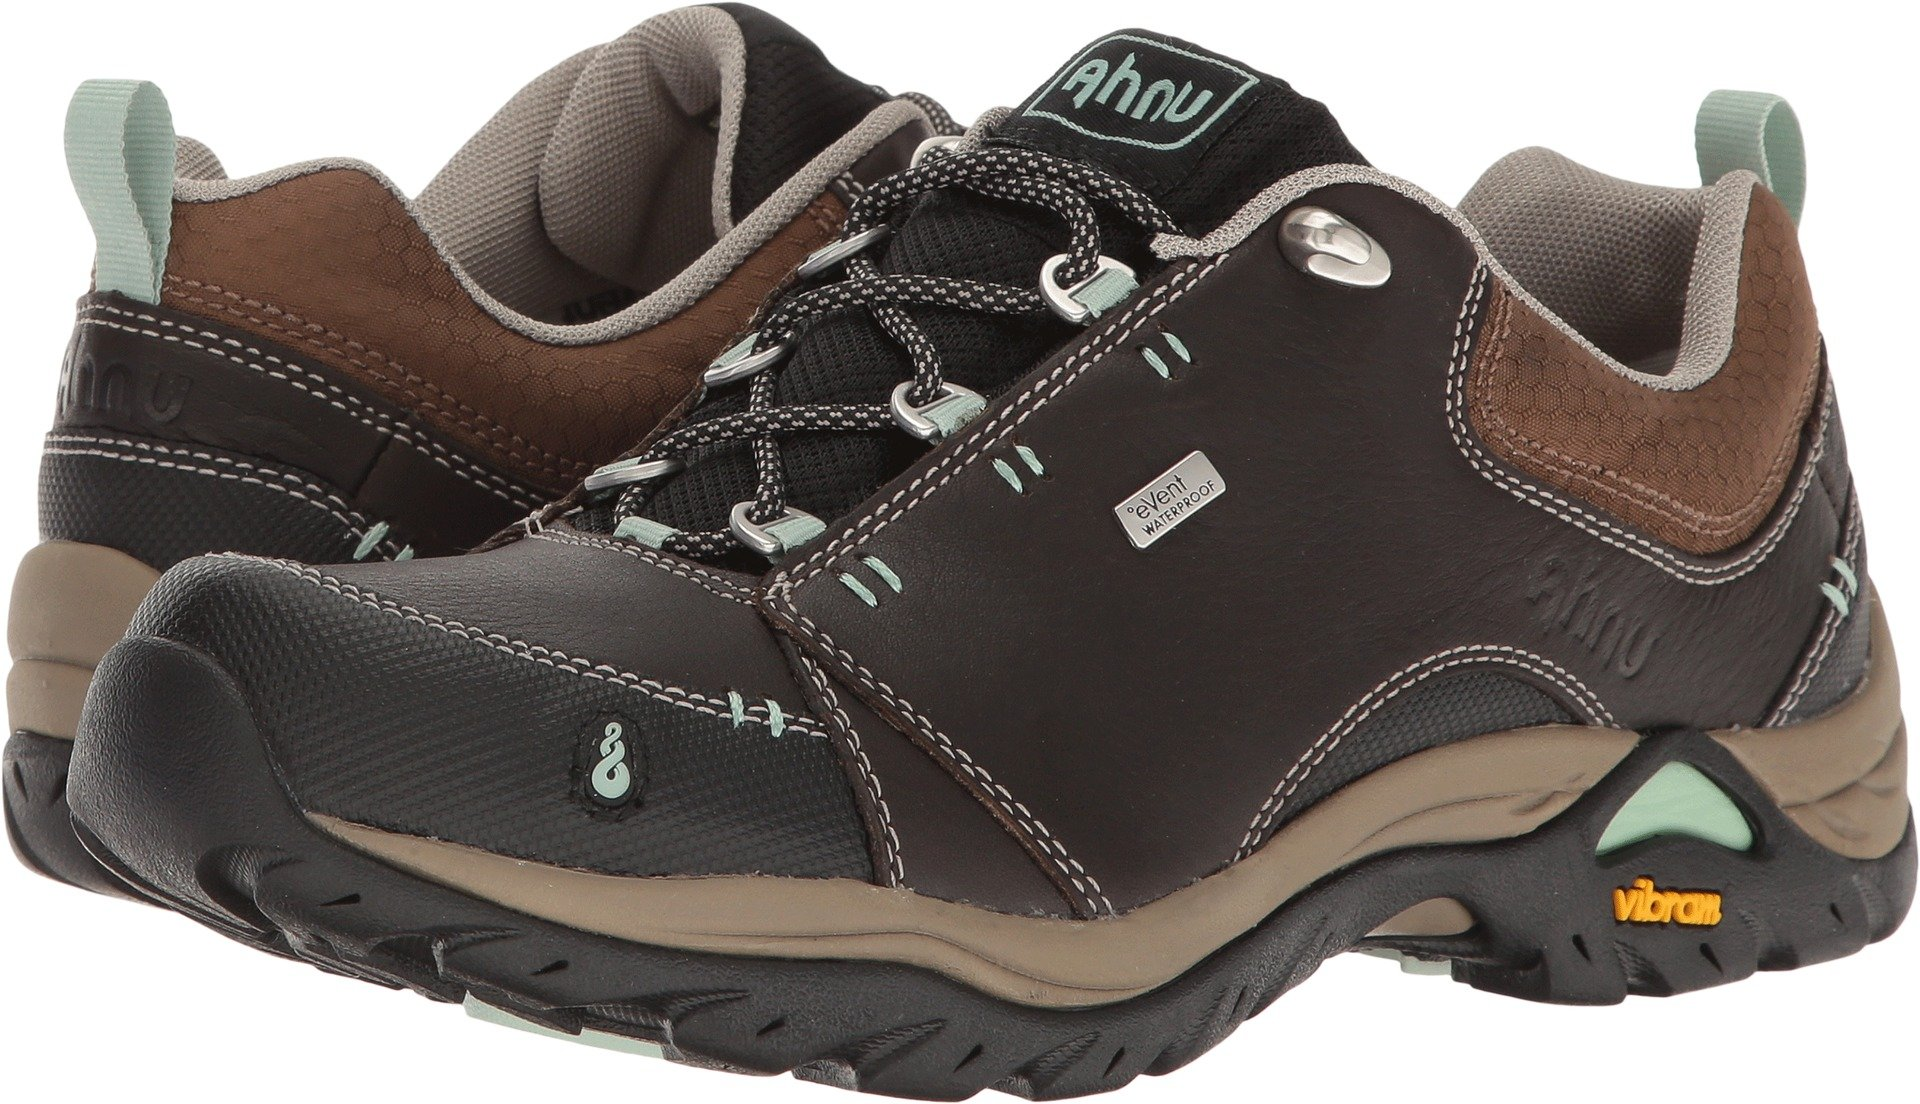 Ahnu Women's W Montara II Waterproof Hiking Shoe, Smokey Brown, 7.5 M US